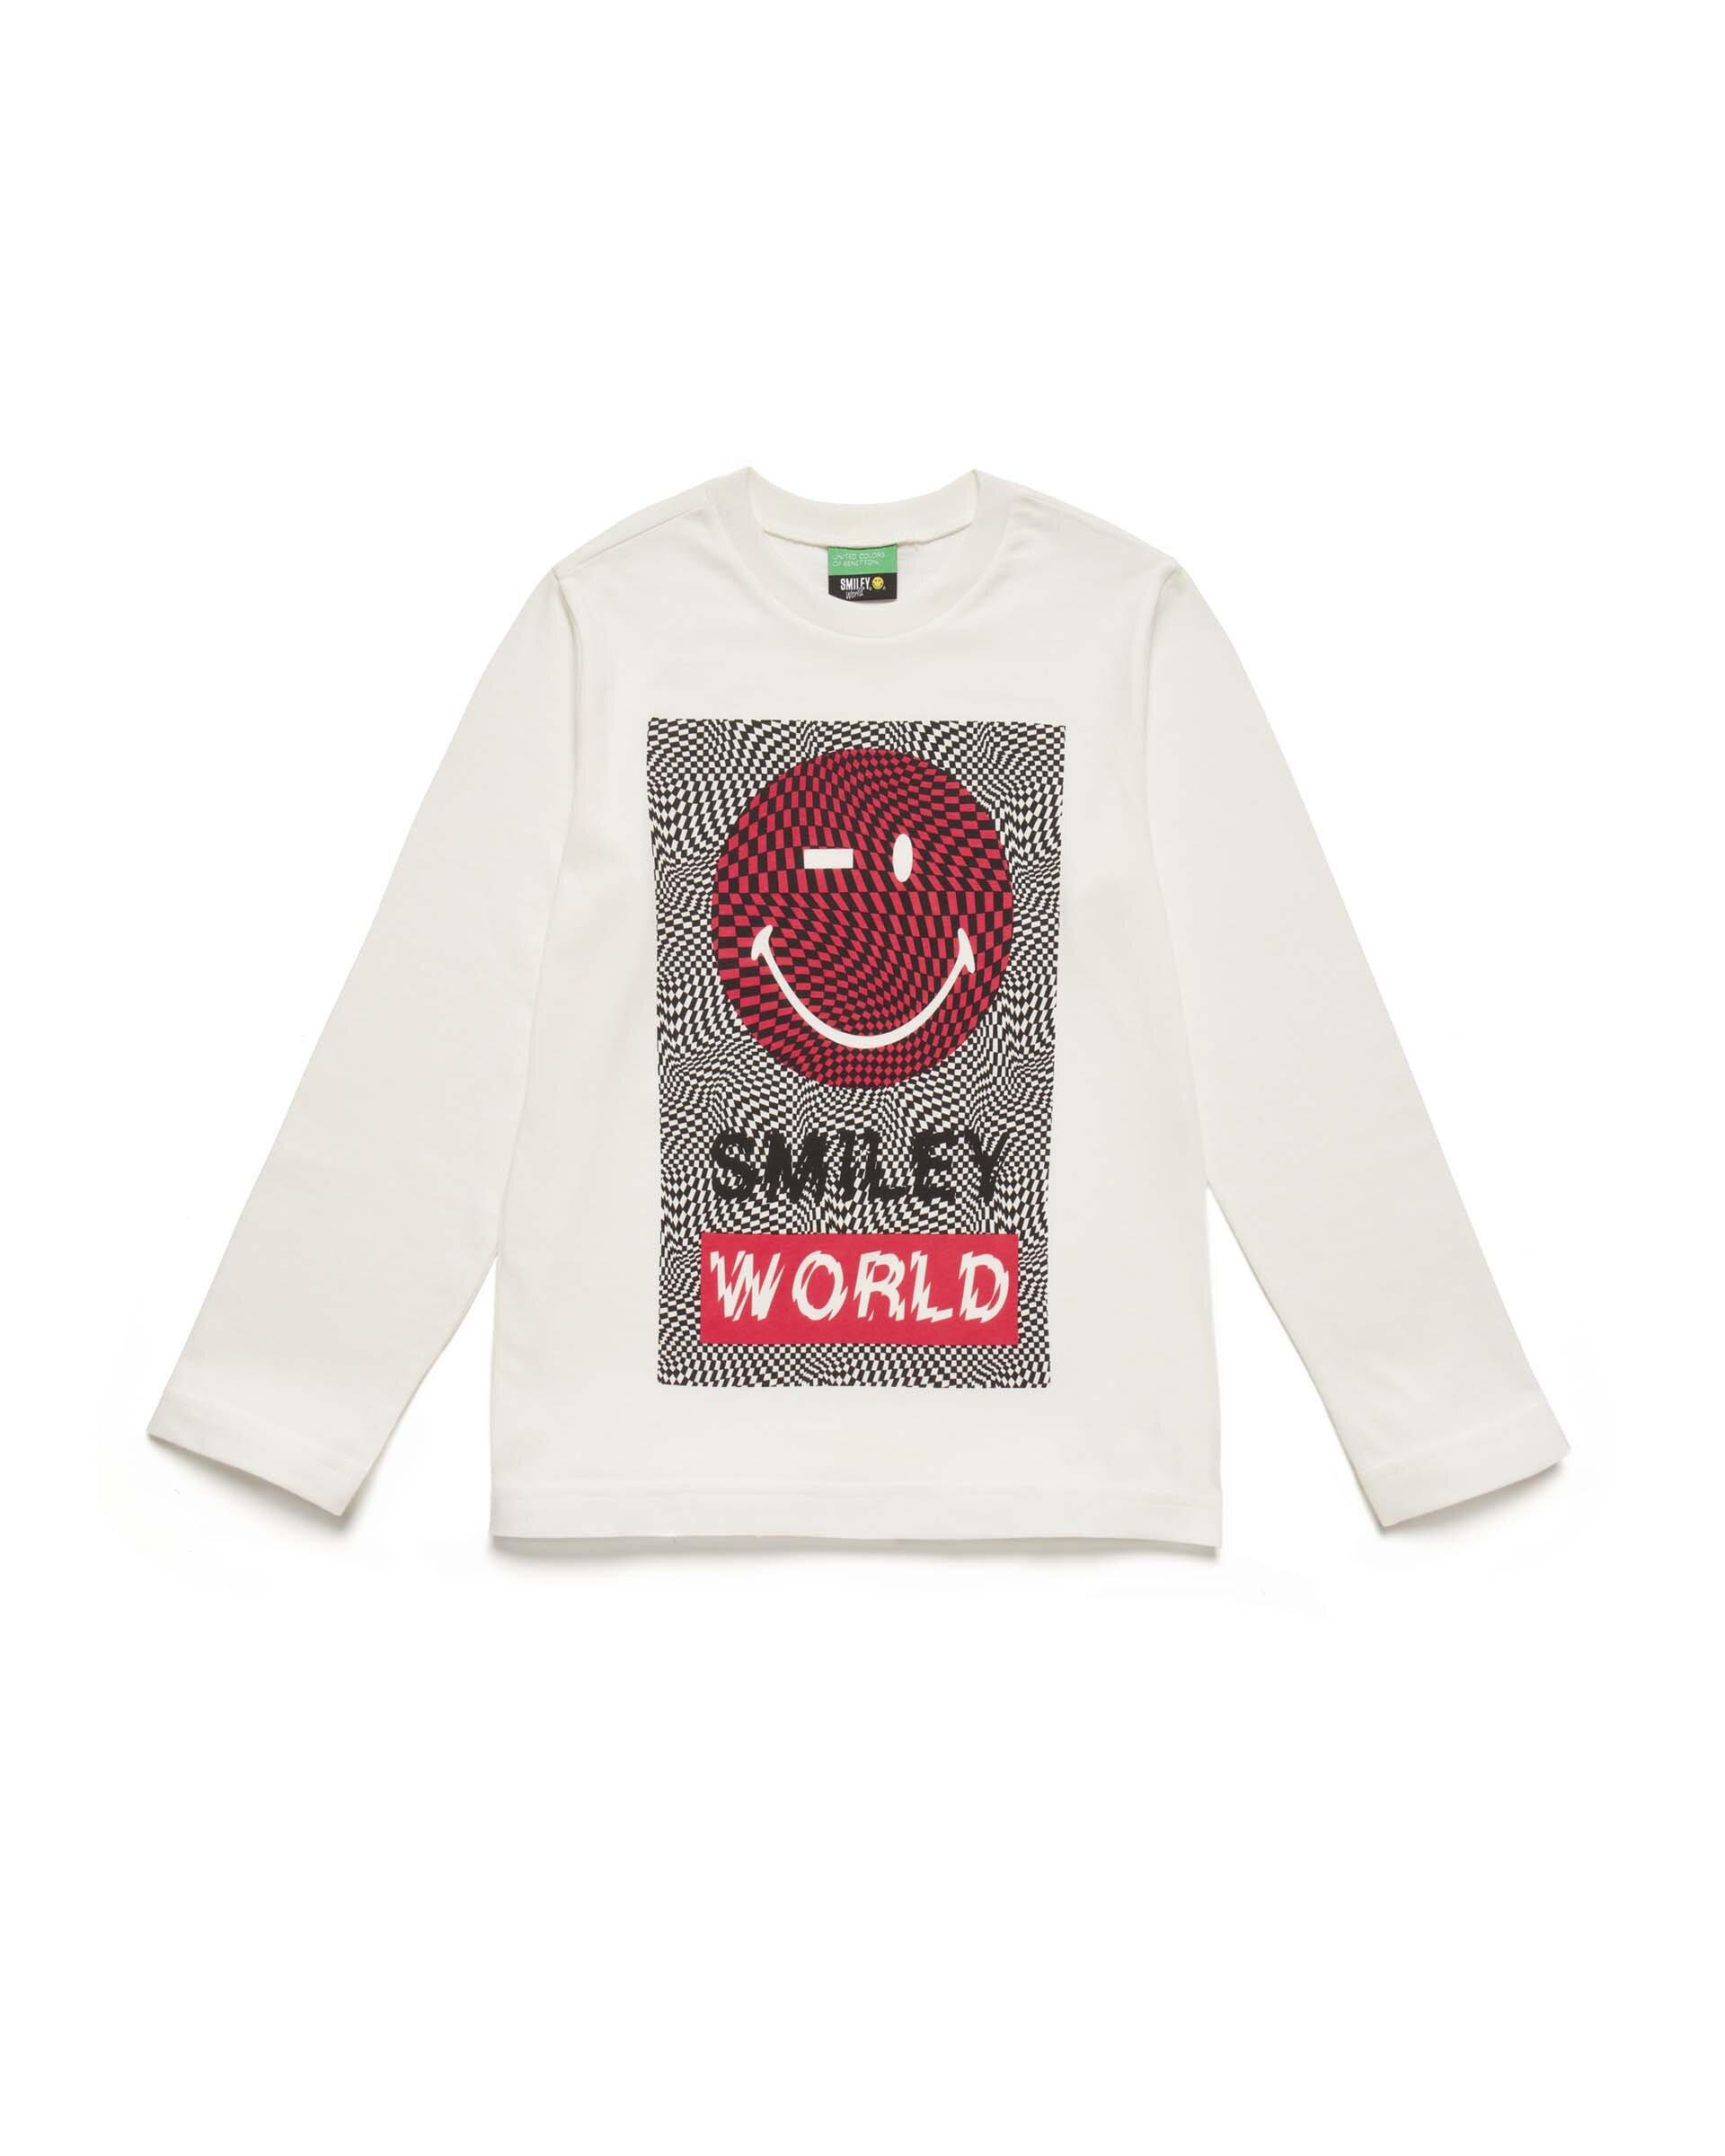 Smiley Grafikli Tshirt